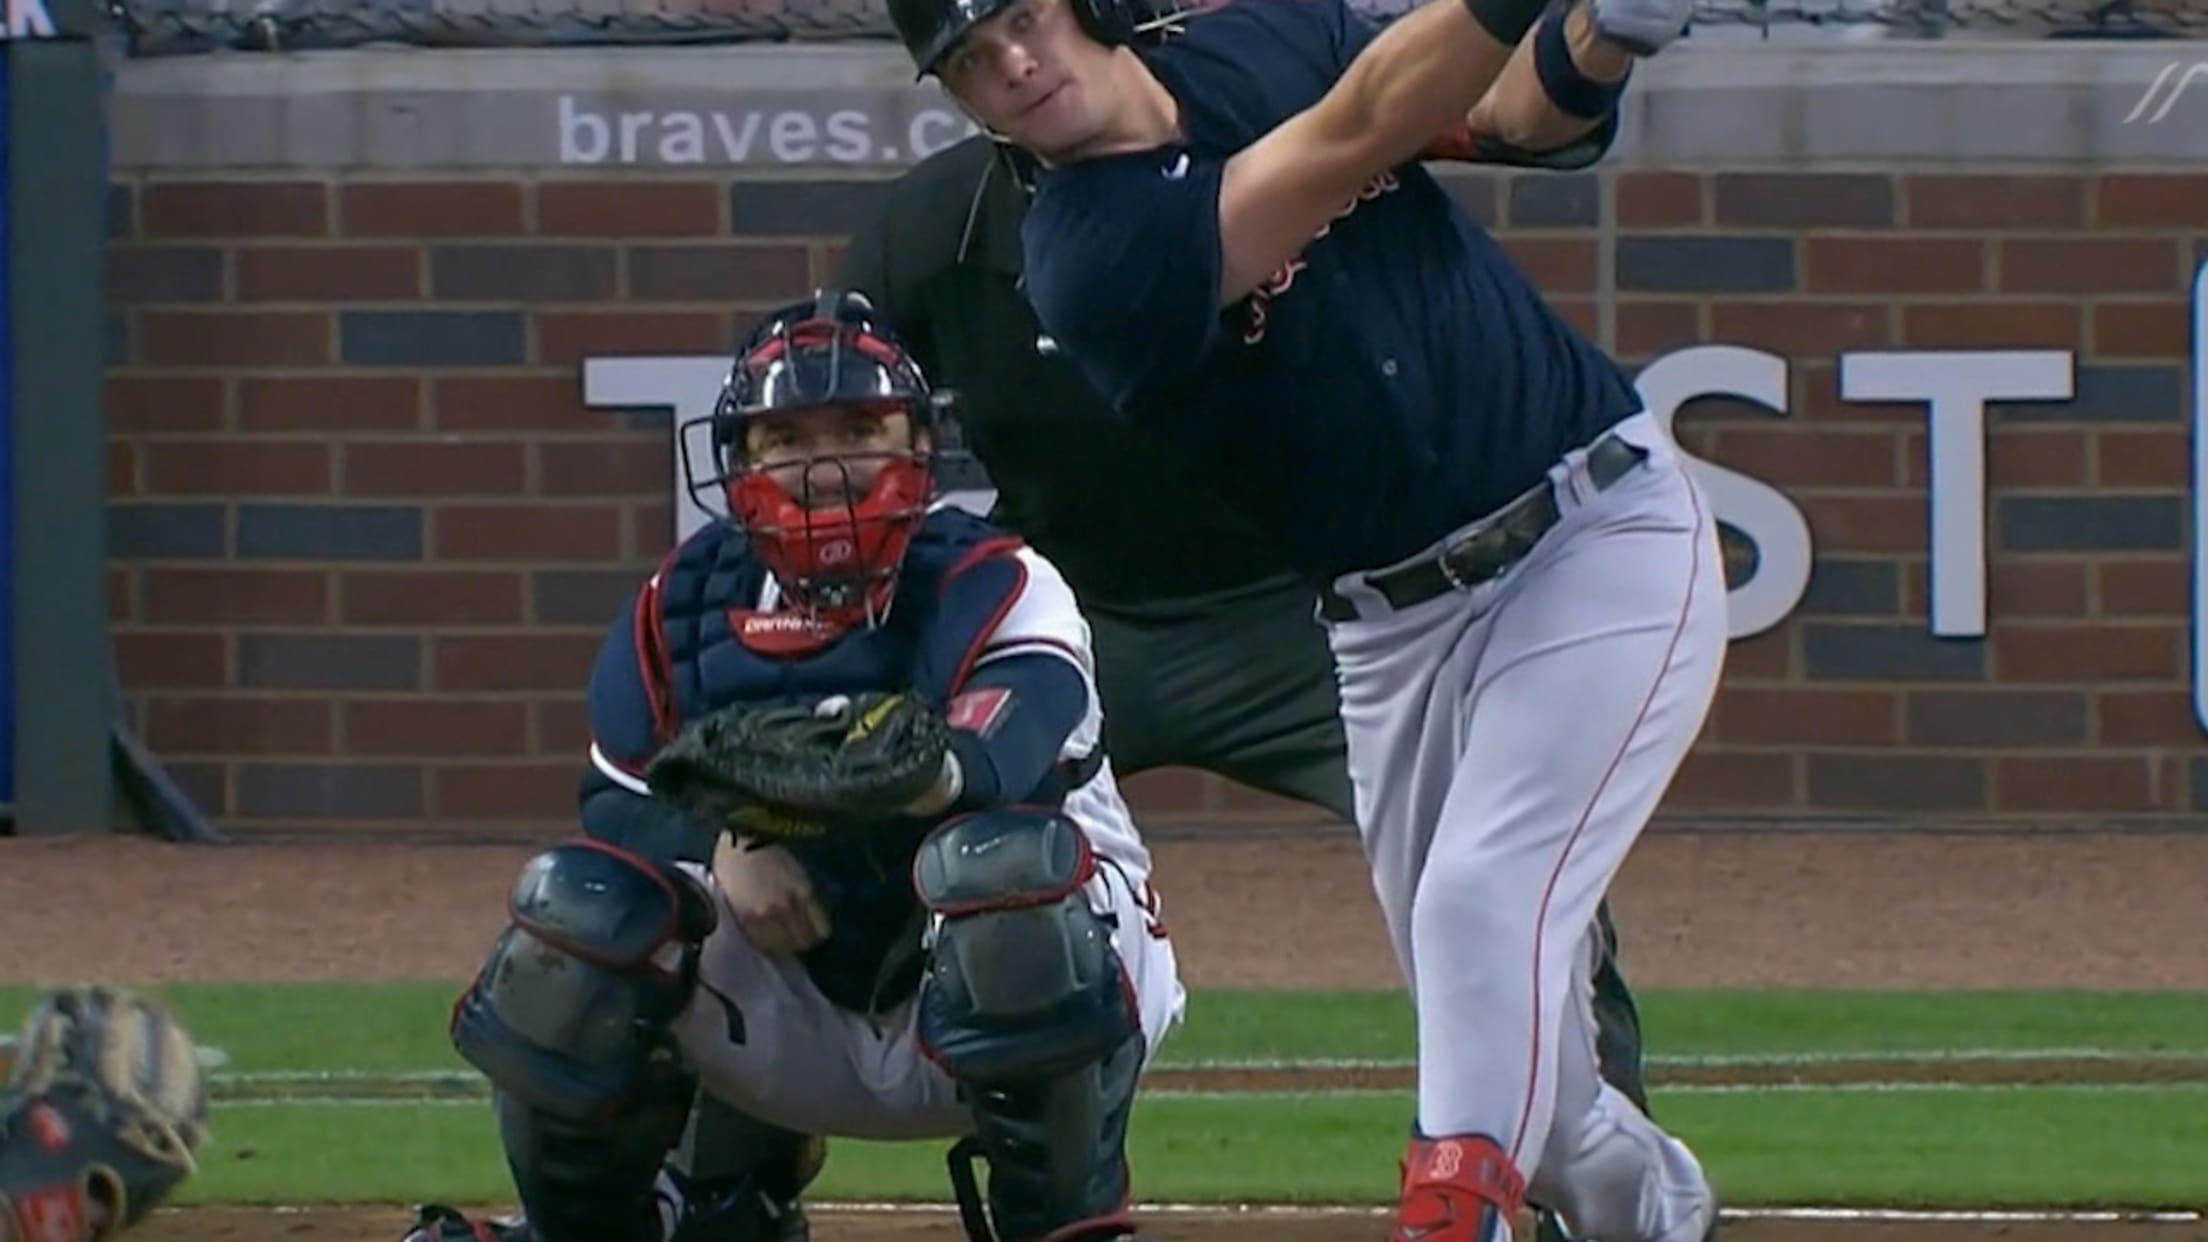 Bobby Dalbec's two-run home run